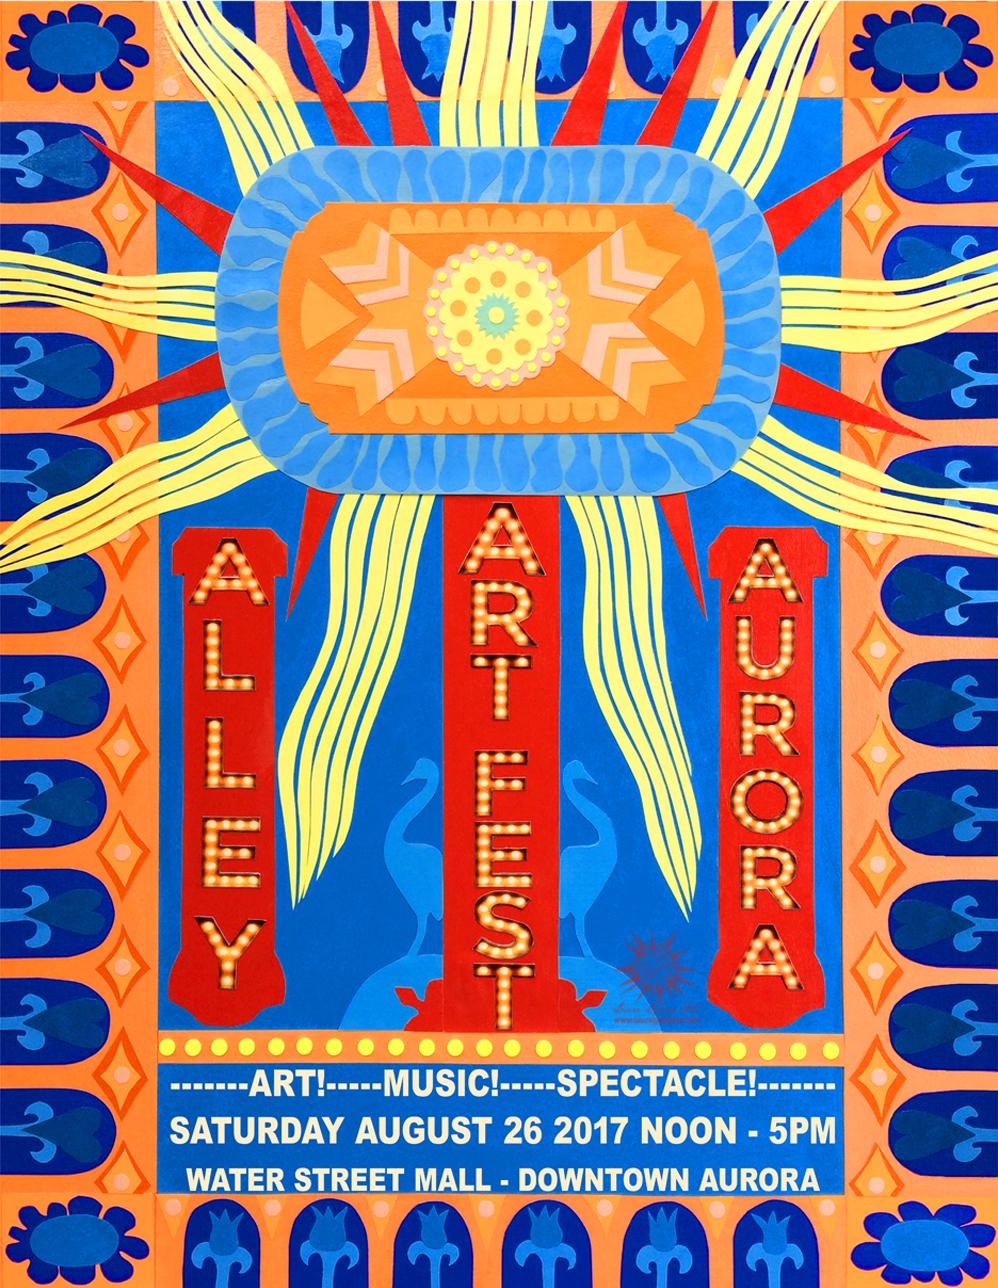 Alley Art Fest Poster Design 2017 based on Paramount Theater Light by Laura Lynne Art